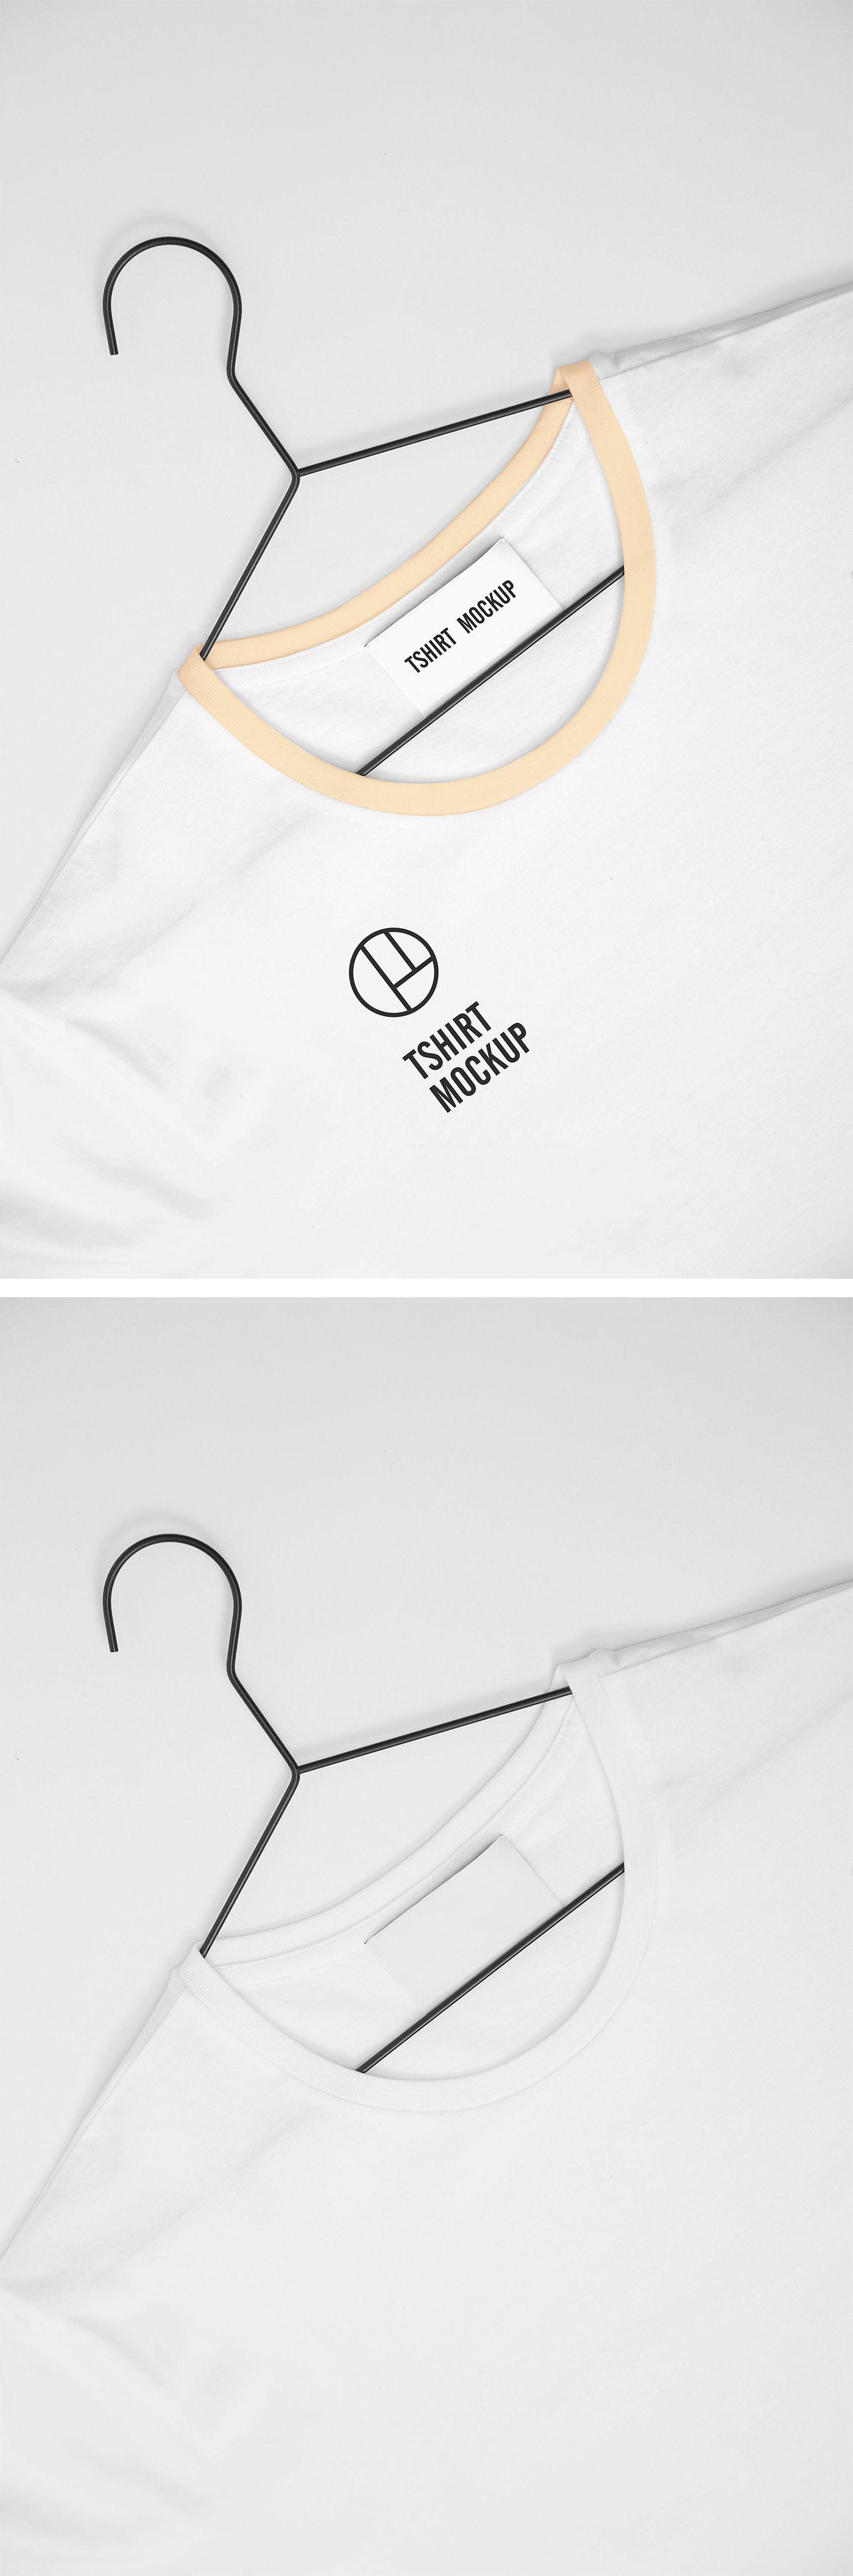 Download White T Shirt Mockup Shirt Mockup Tshirt Mockup Graphic Design Freebies